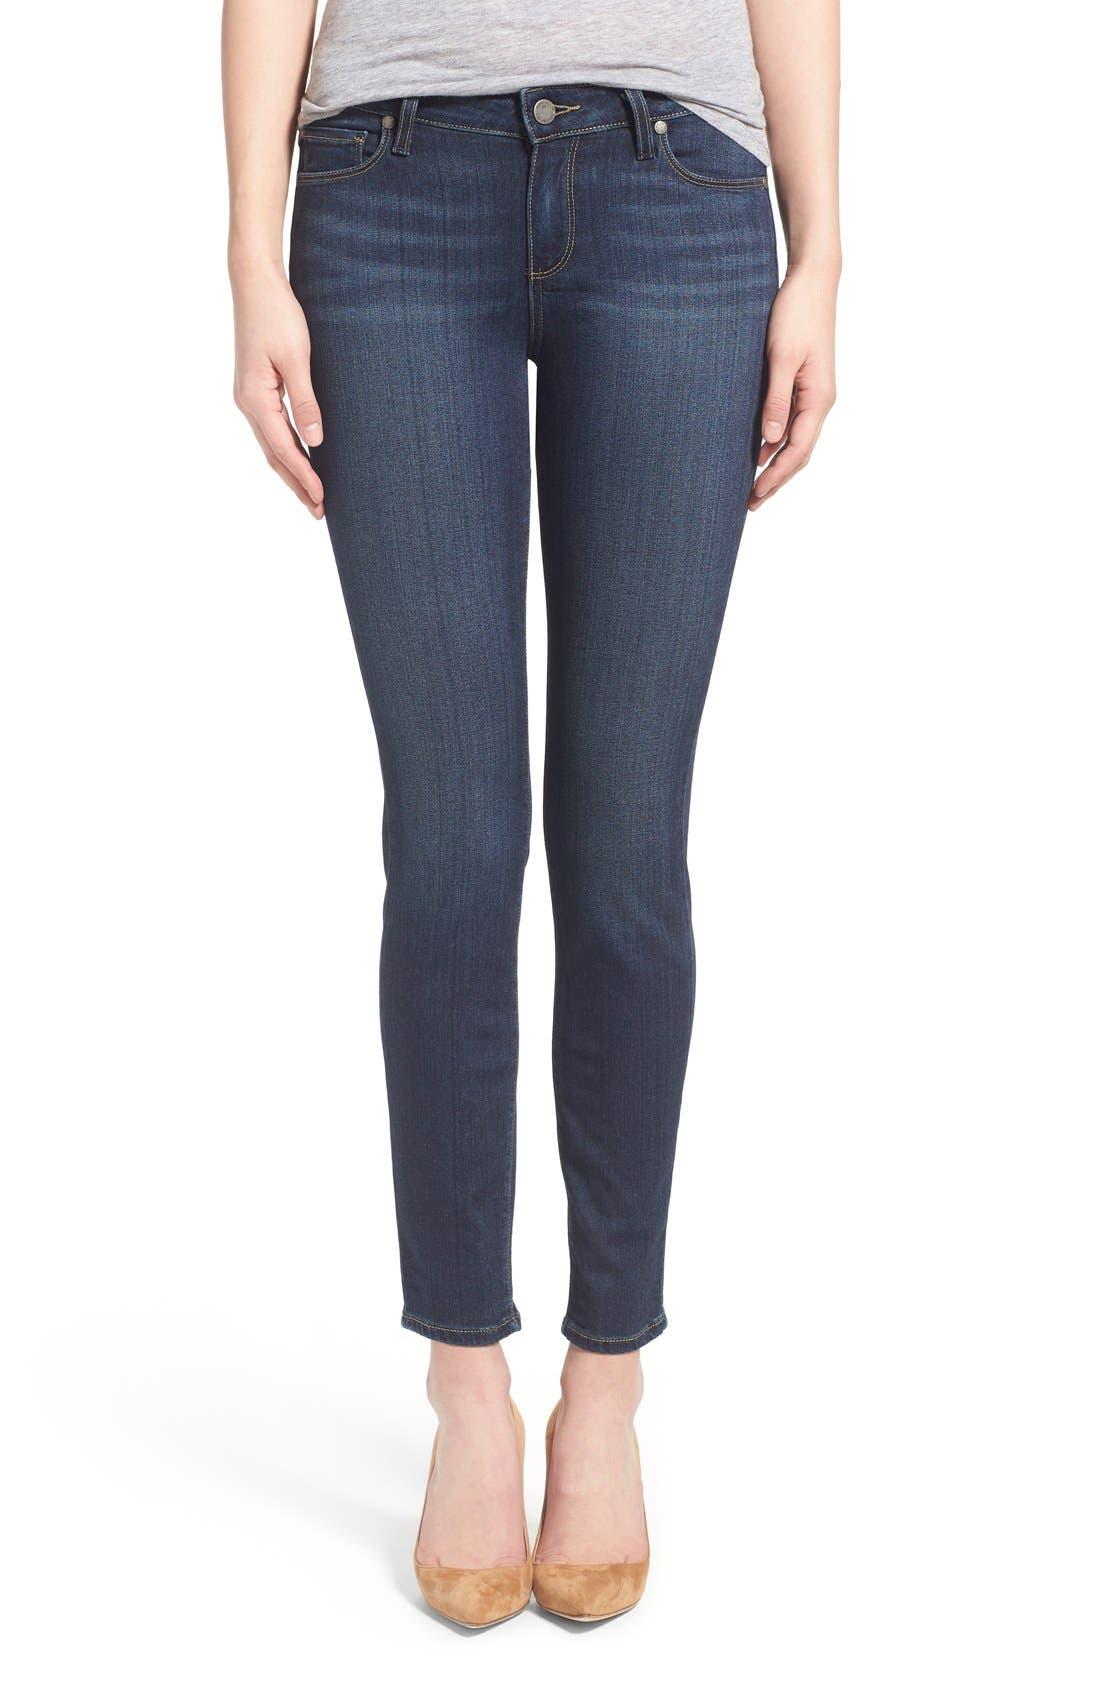 Main Image - Paige Denim 'Transcend - Verdugo' Ankle Ultra Skinny Jeans (Nottingham) (Petite)